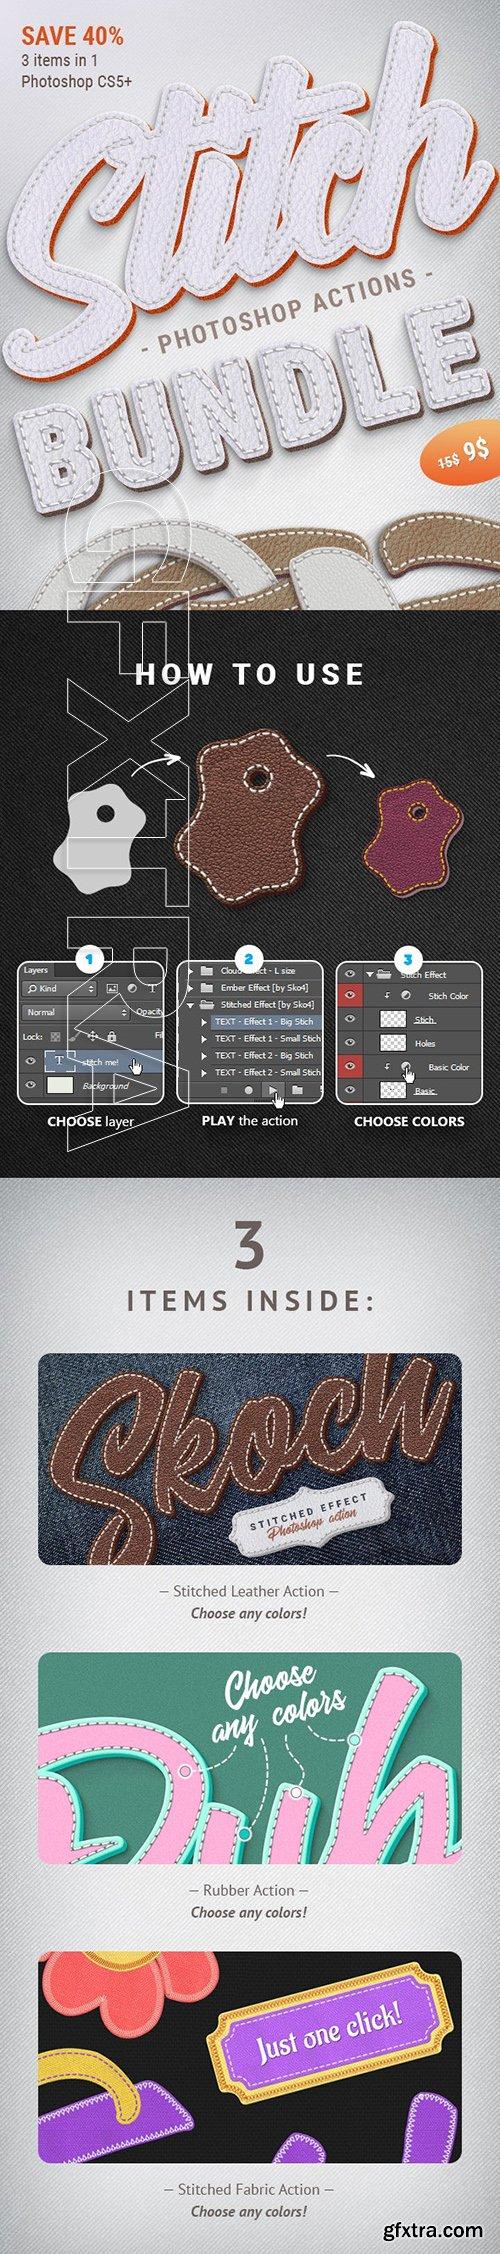 GraphicRiver - Stitched Actions Bundle 24494393